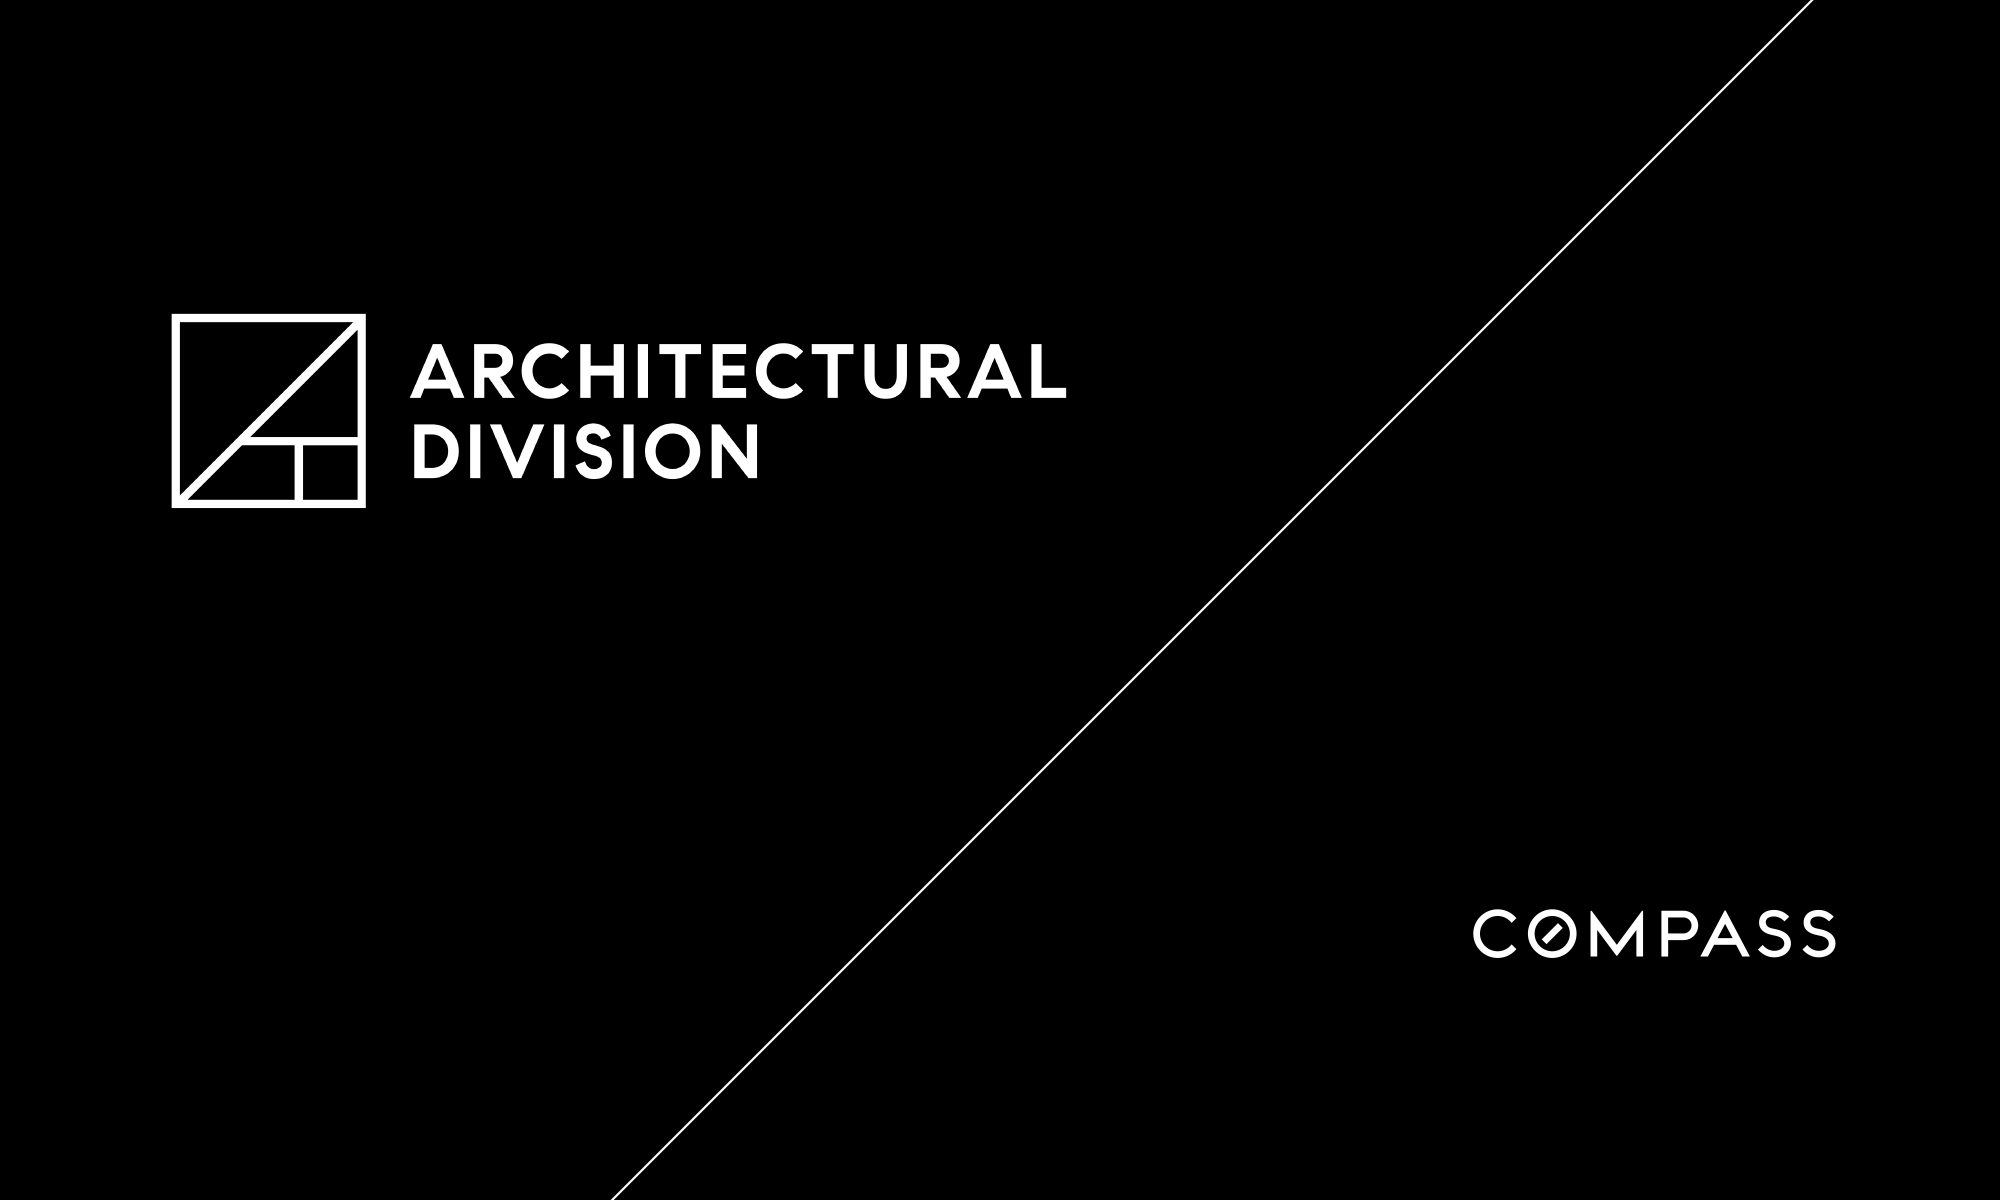 compass architectural